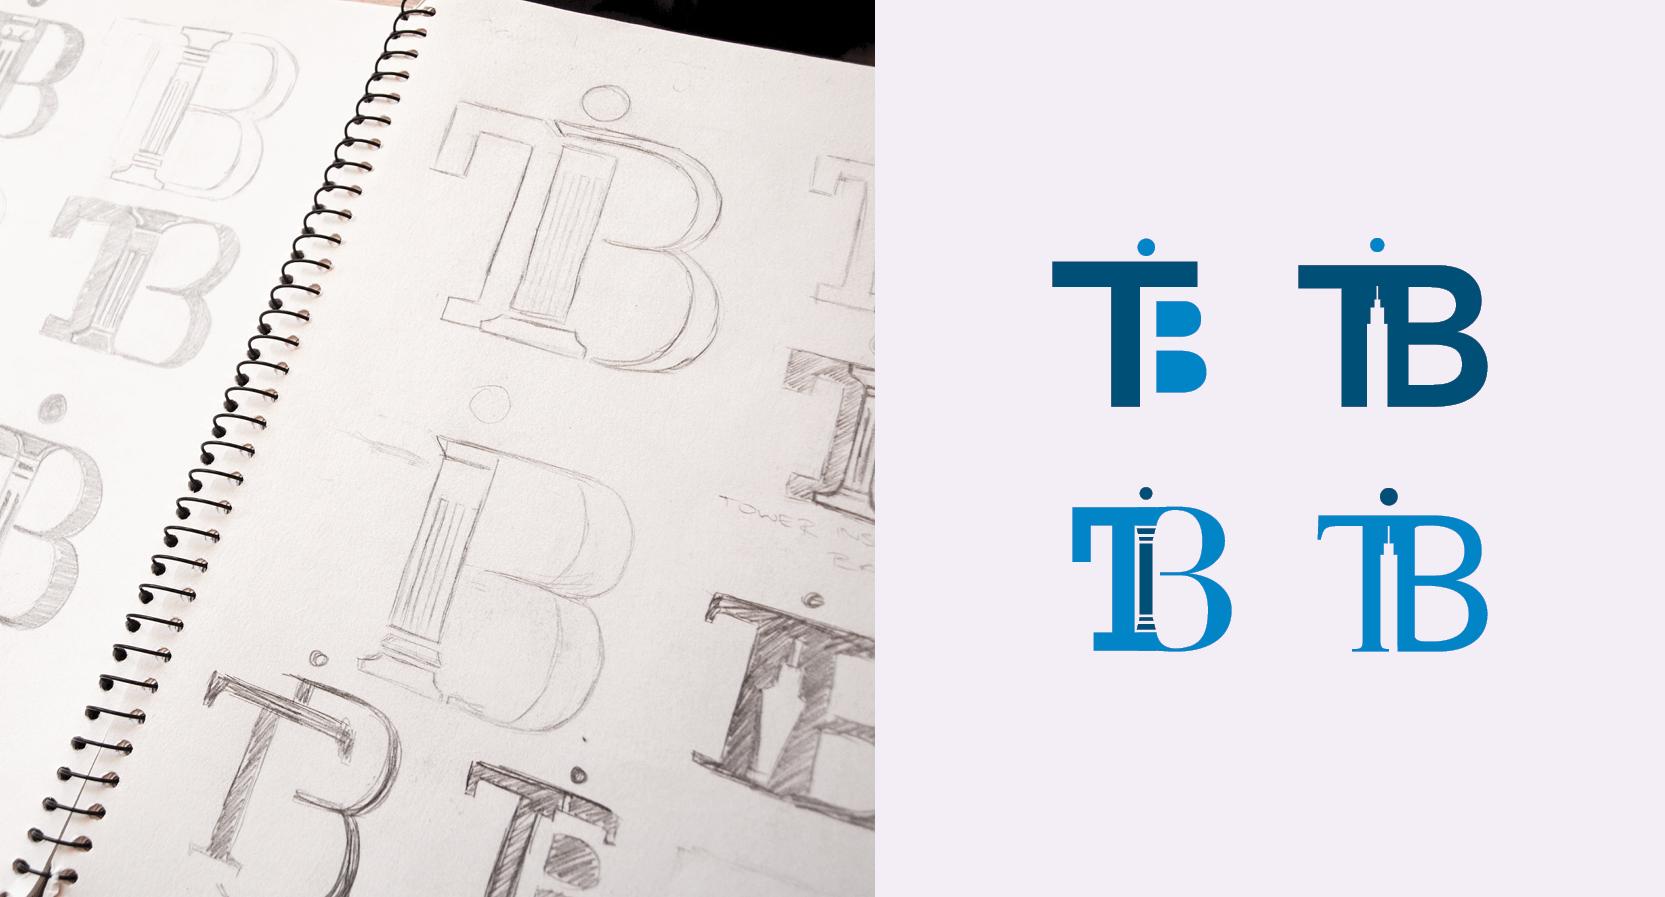 Tower-logo-designs